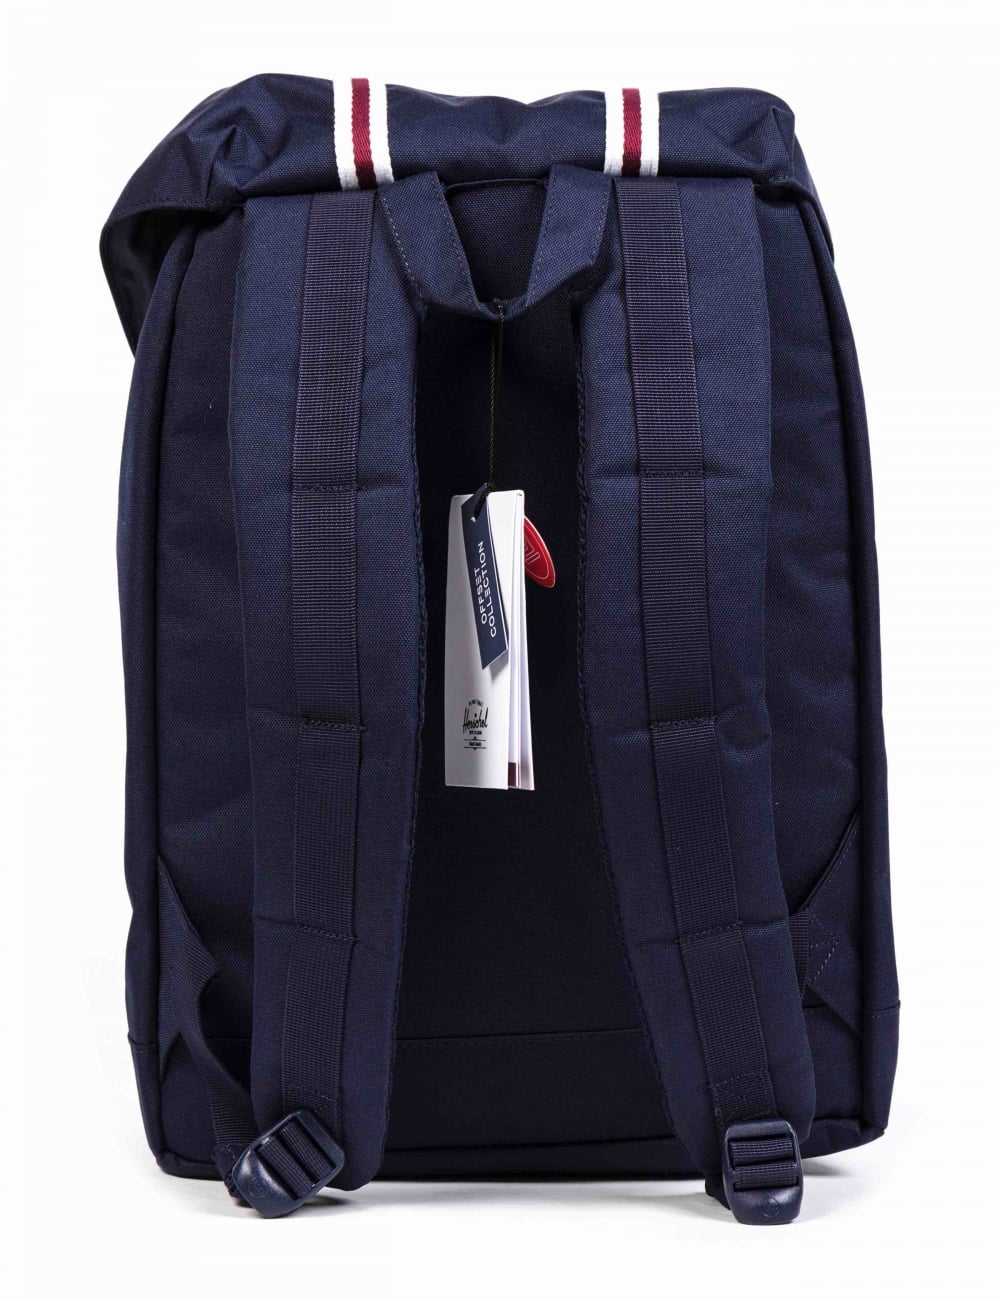 f97e63e405c5 Herschel Supply Co Retreat 19.5L Backpack - Peacoat White Windsor ...